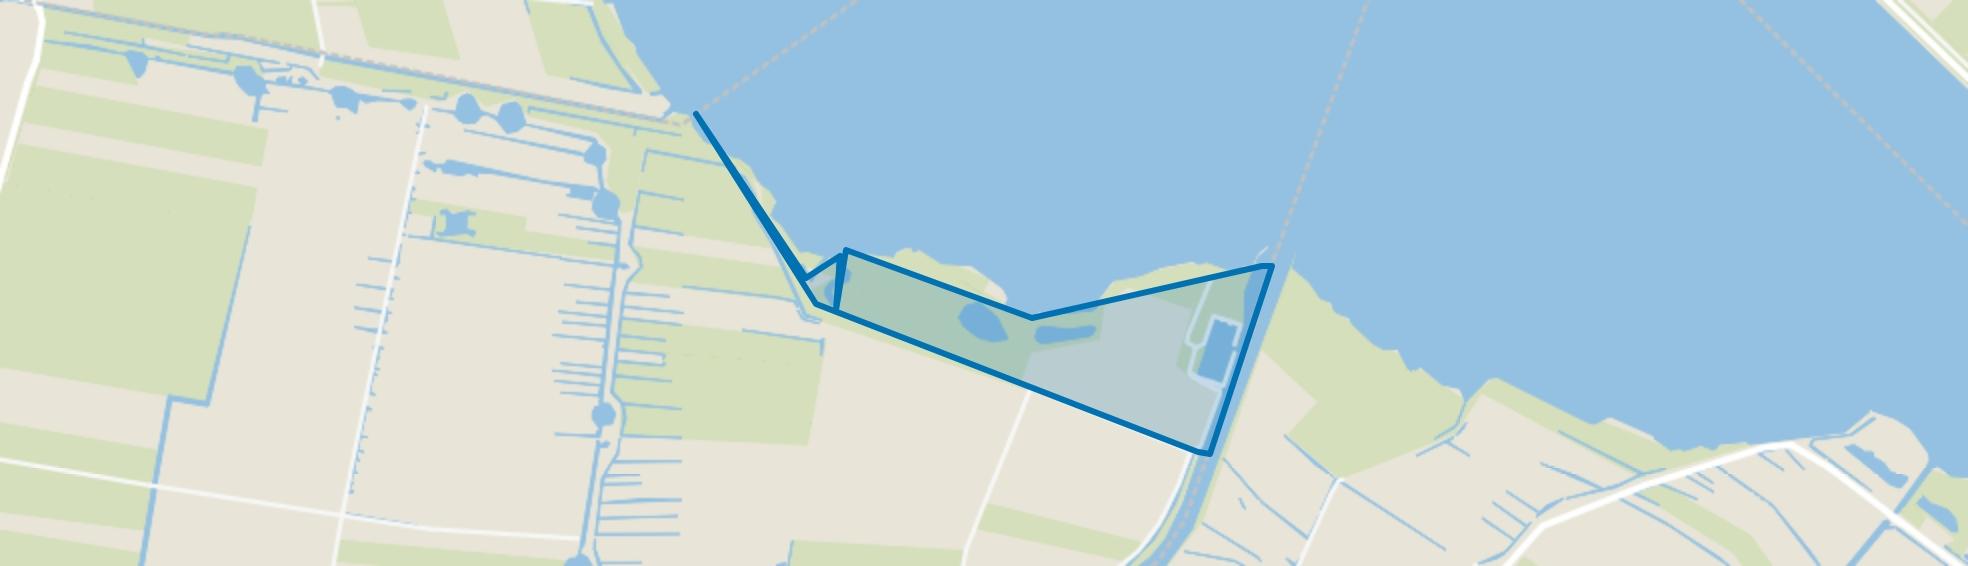 Eemmeer-Eemnes, Eemnes map